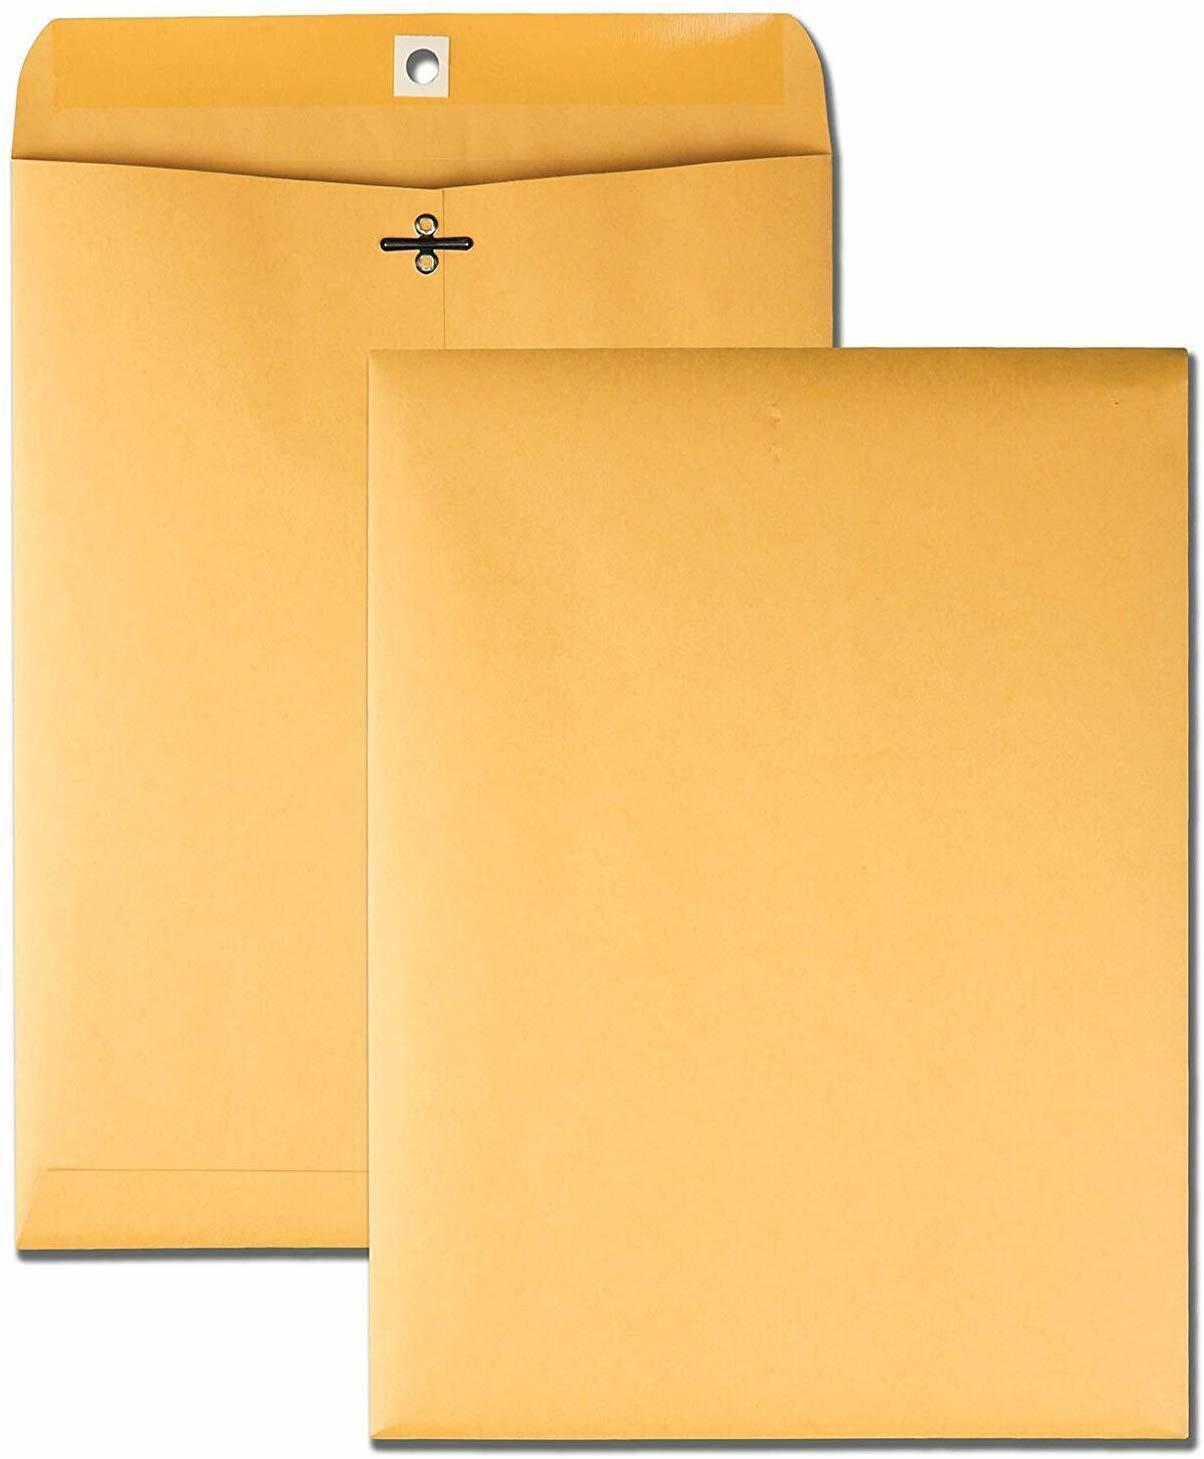 Brown Kraft Catalog Clasp Envelopes, Gummed Seal, 10 x 13, 1